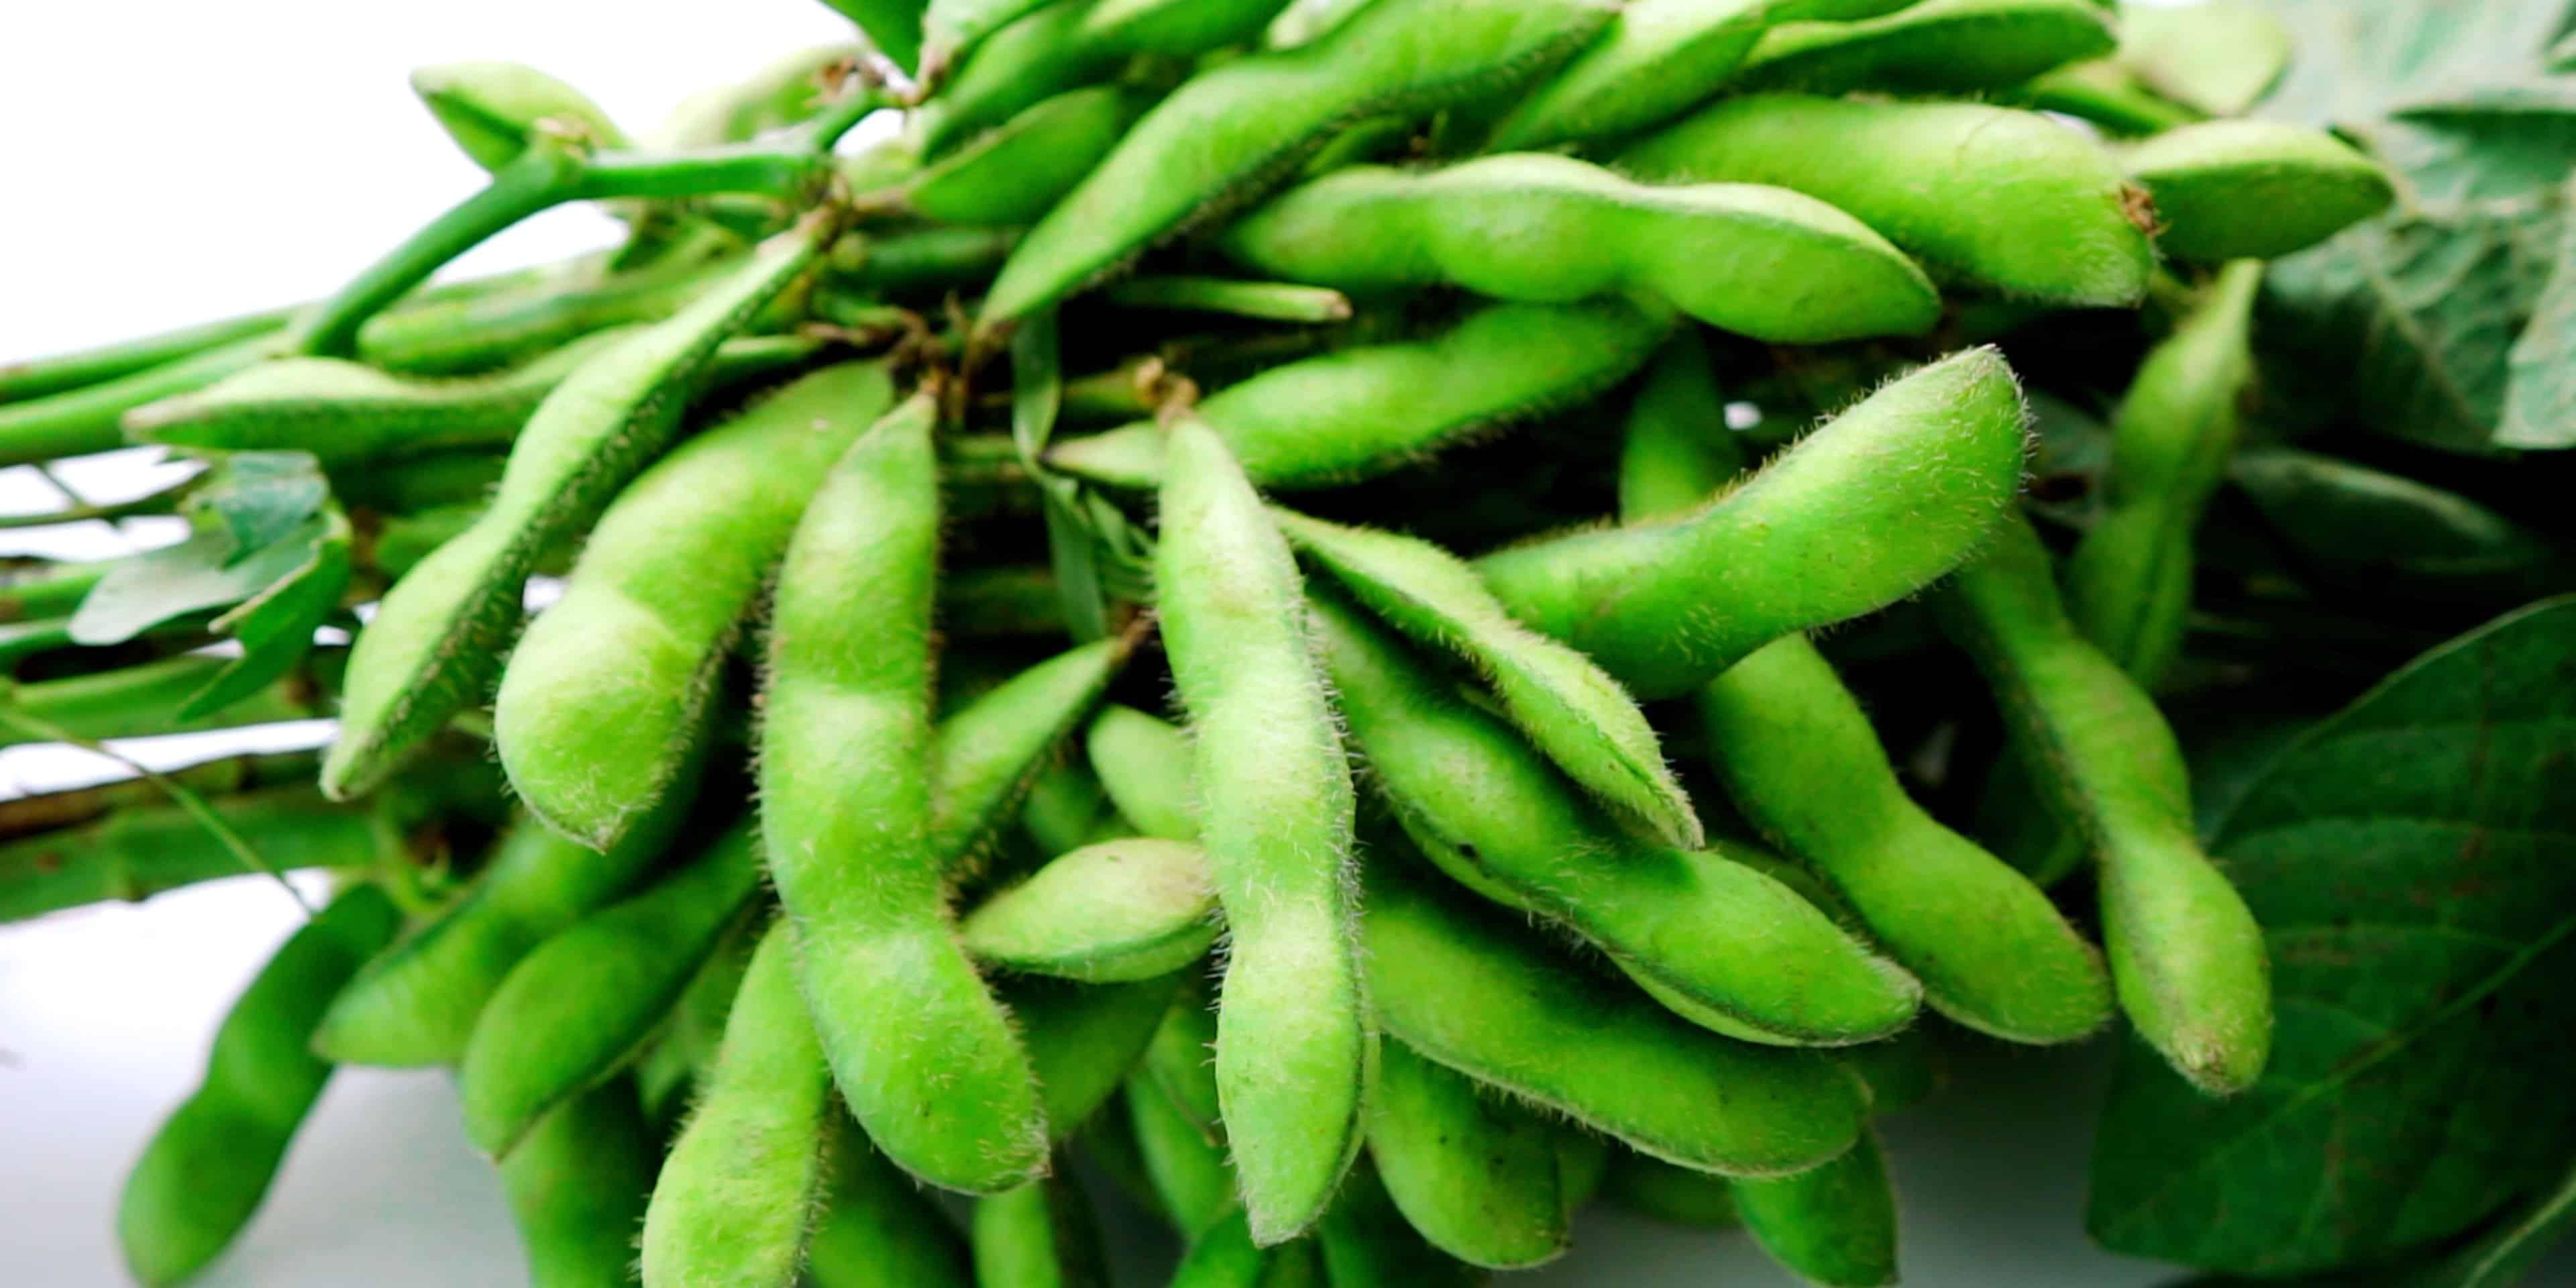 Edamame or green soybeans still on their stalks.